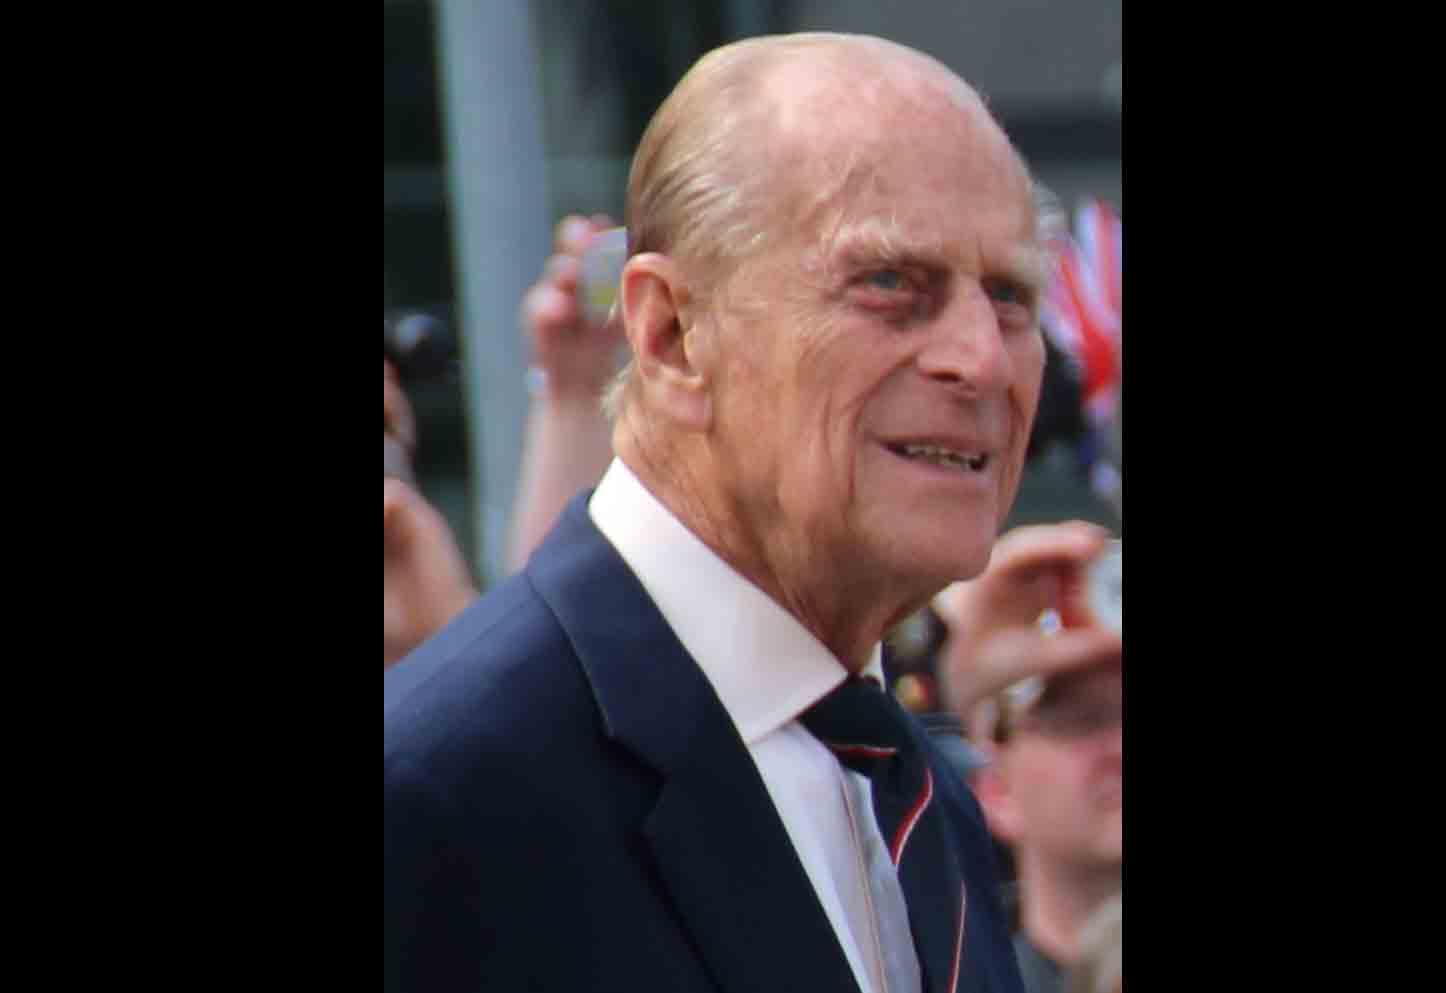 Marido da rainha da Inglaterra morre aos 89 anos. Foto: wikipedia